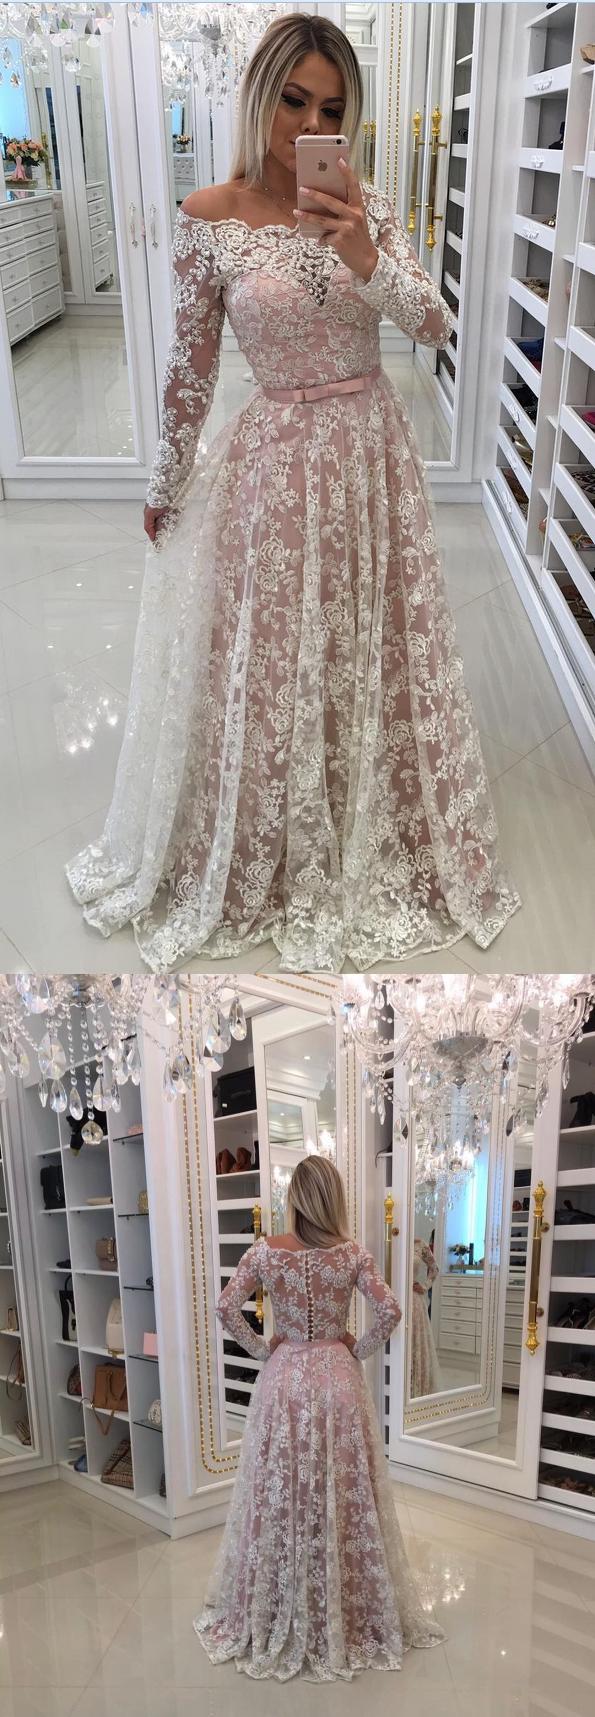 Pink dress design 2018  white long lace prom dress long sleeves prom dress elegant